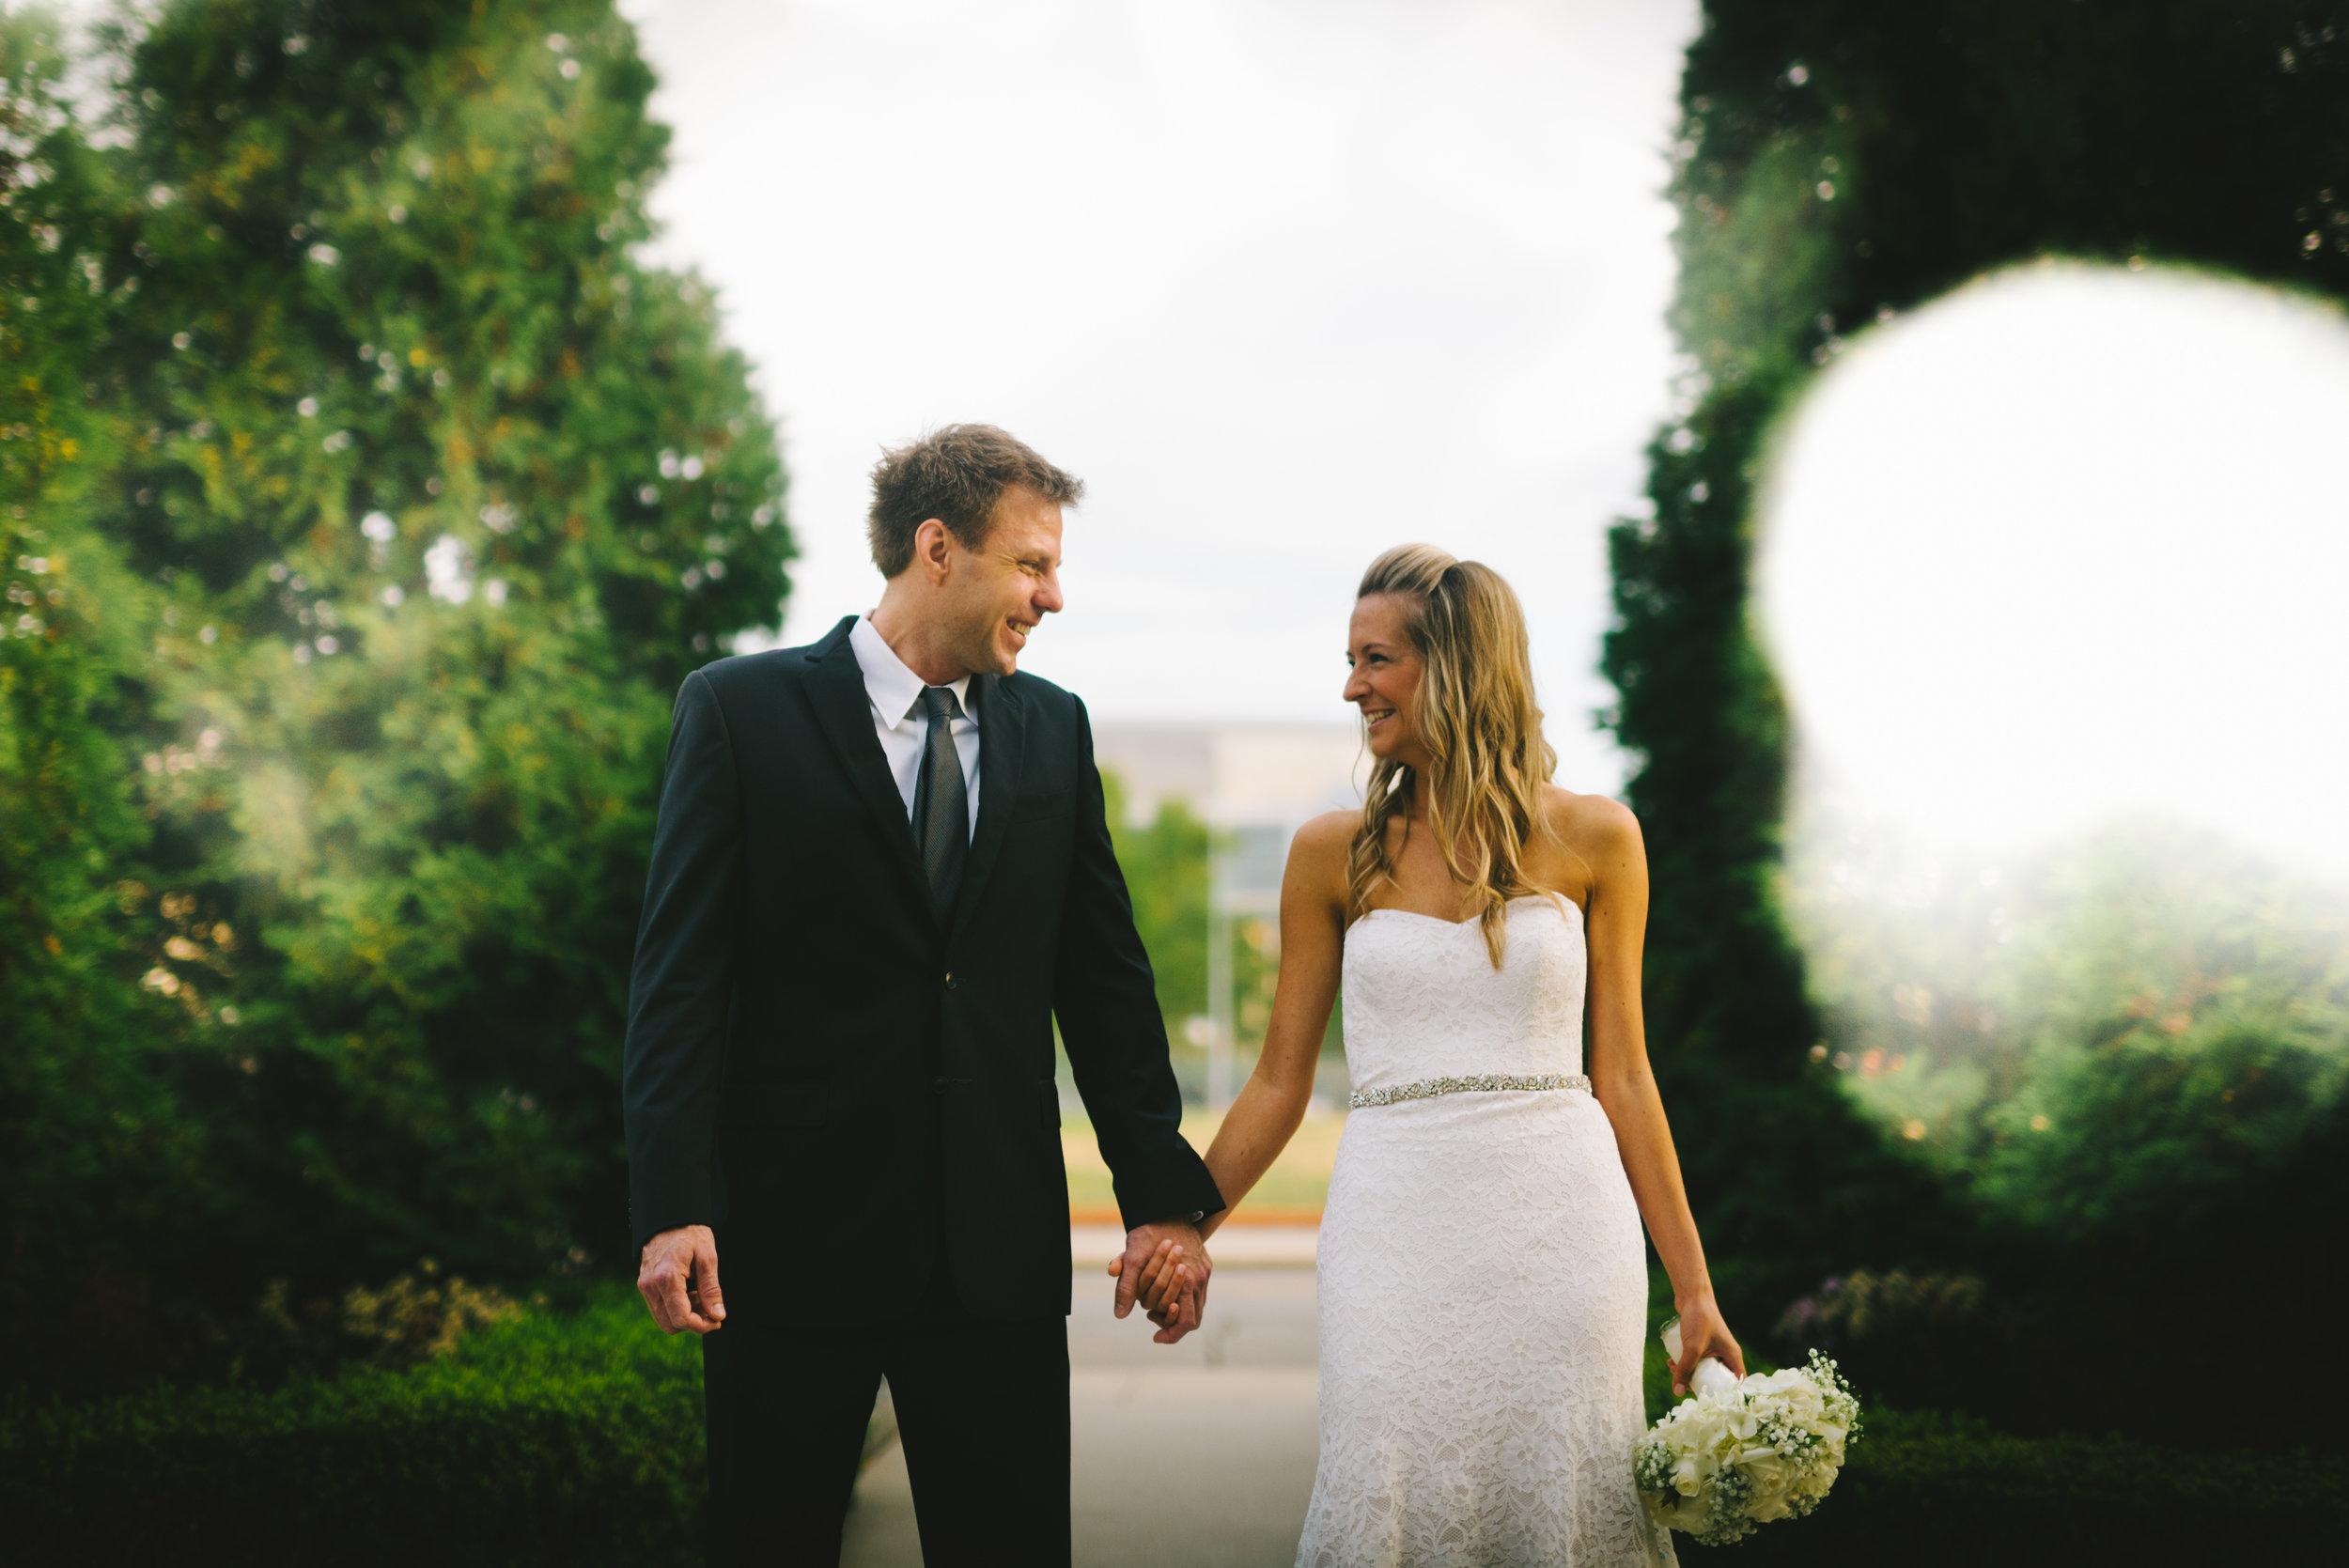 Des-Moines-Wedding-Blog-Kayla-Jeff-50.jpg